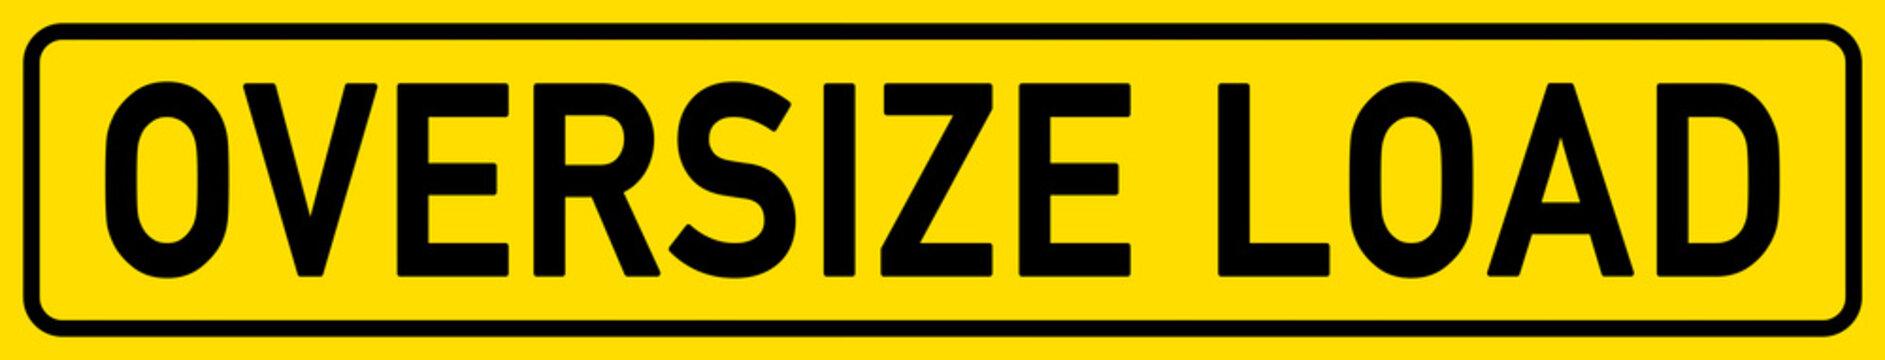 English Signs E297 - Oversize Load